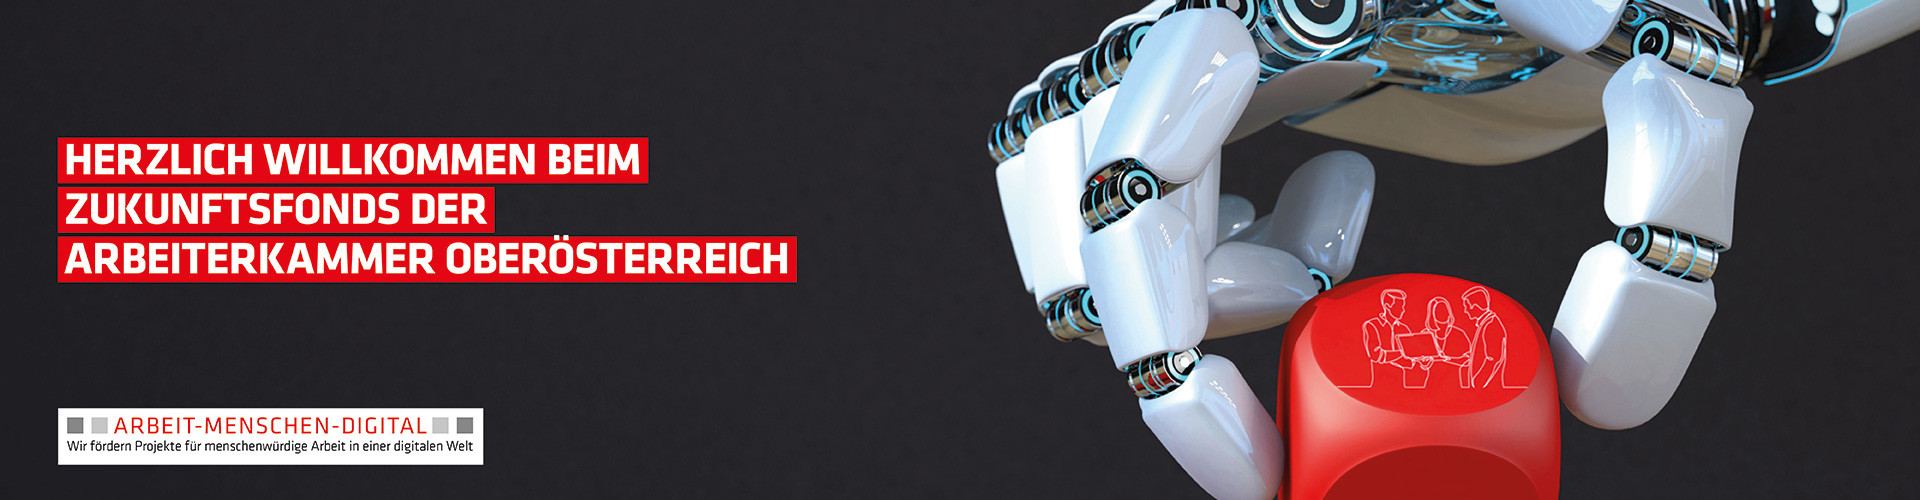 Roboterhand greift Würfel © Alexander Limbach, One Line Man, fotolia | akooe